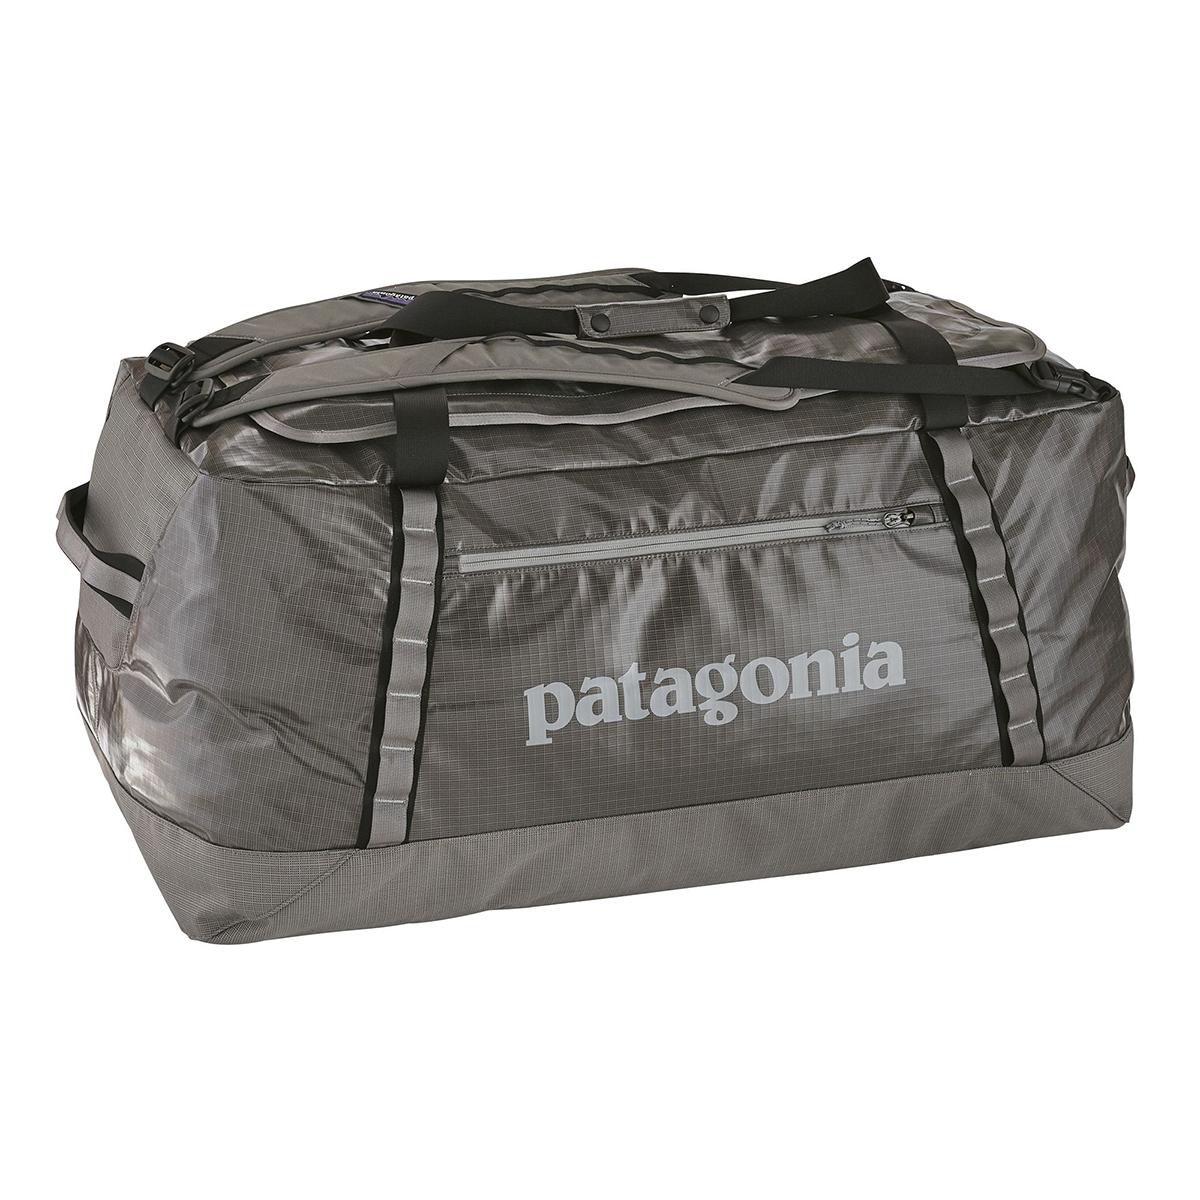 patagonia black hole duffel 120l luggage epictv shop. Black Bedroom Furniture Sets. Home Design Ideas